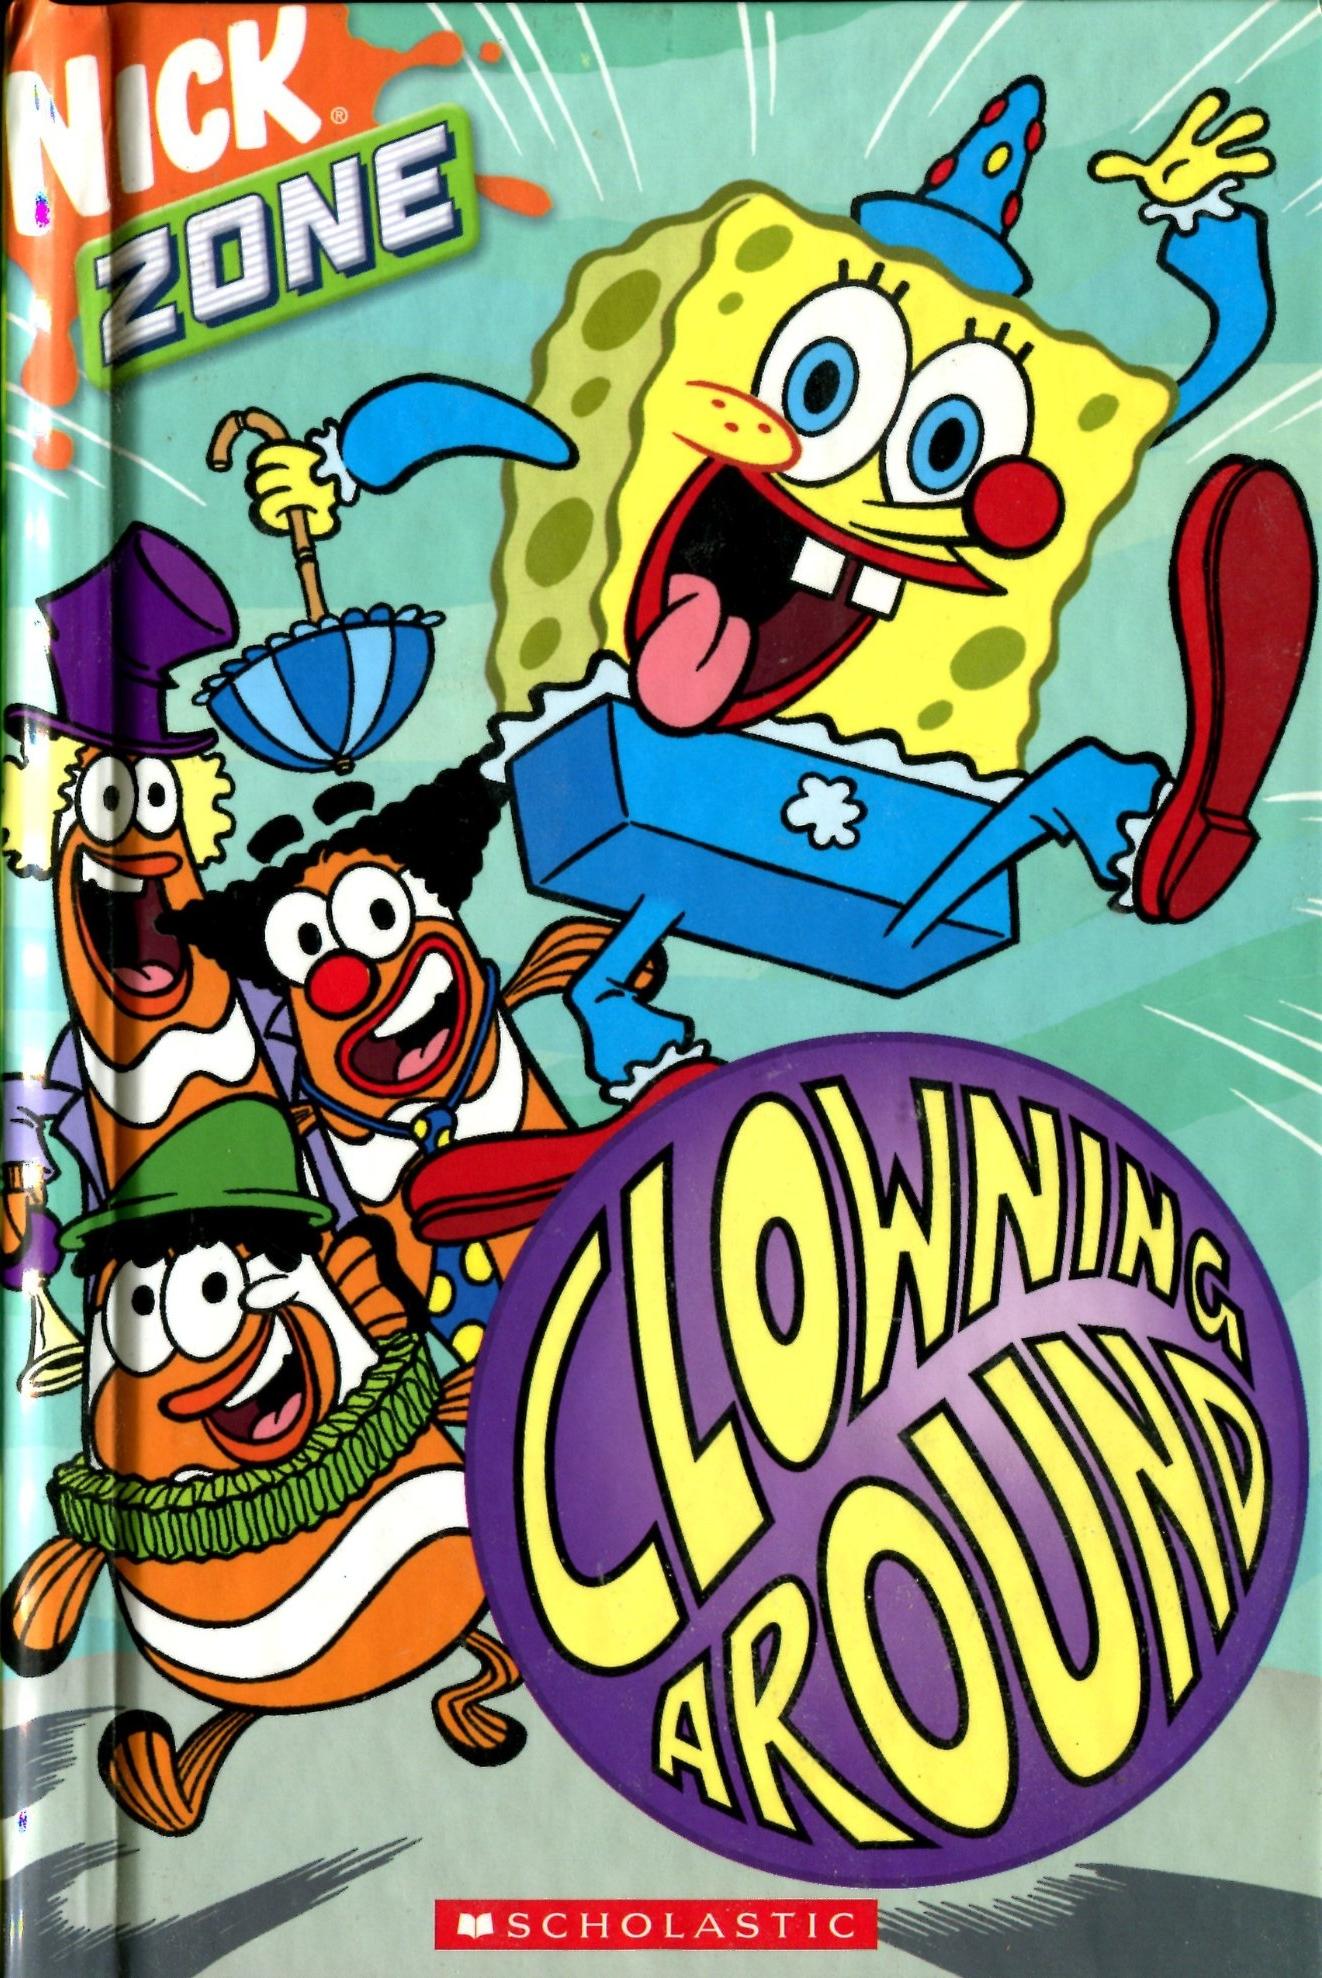 Clowning Around